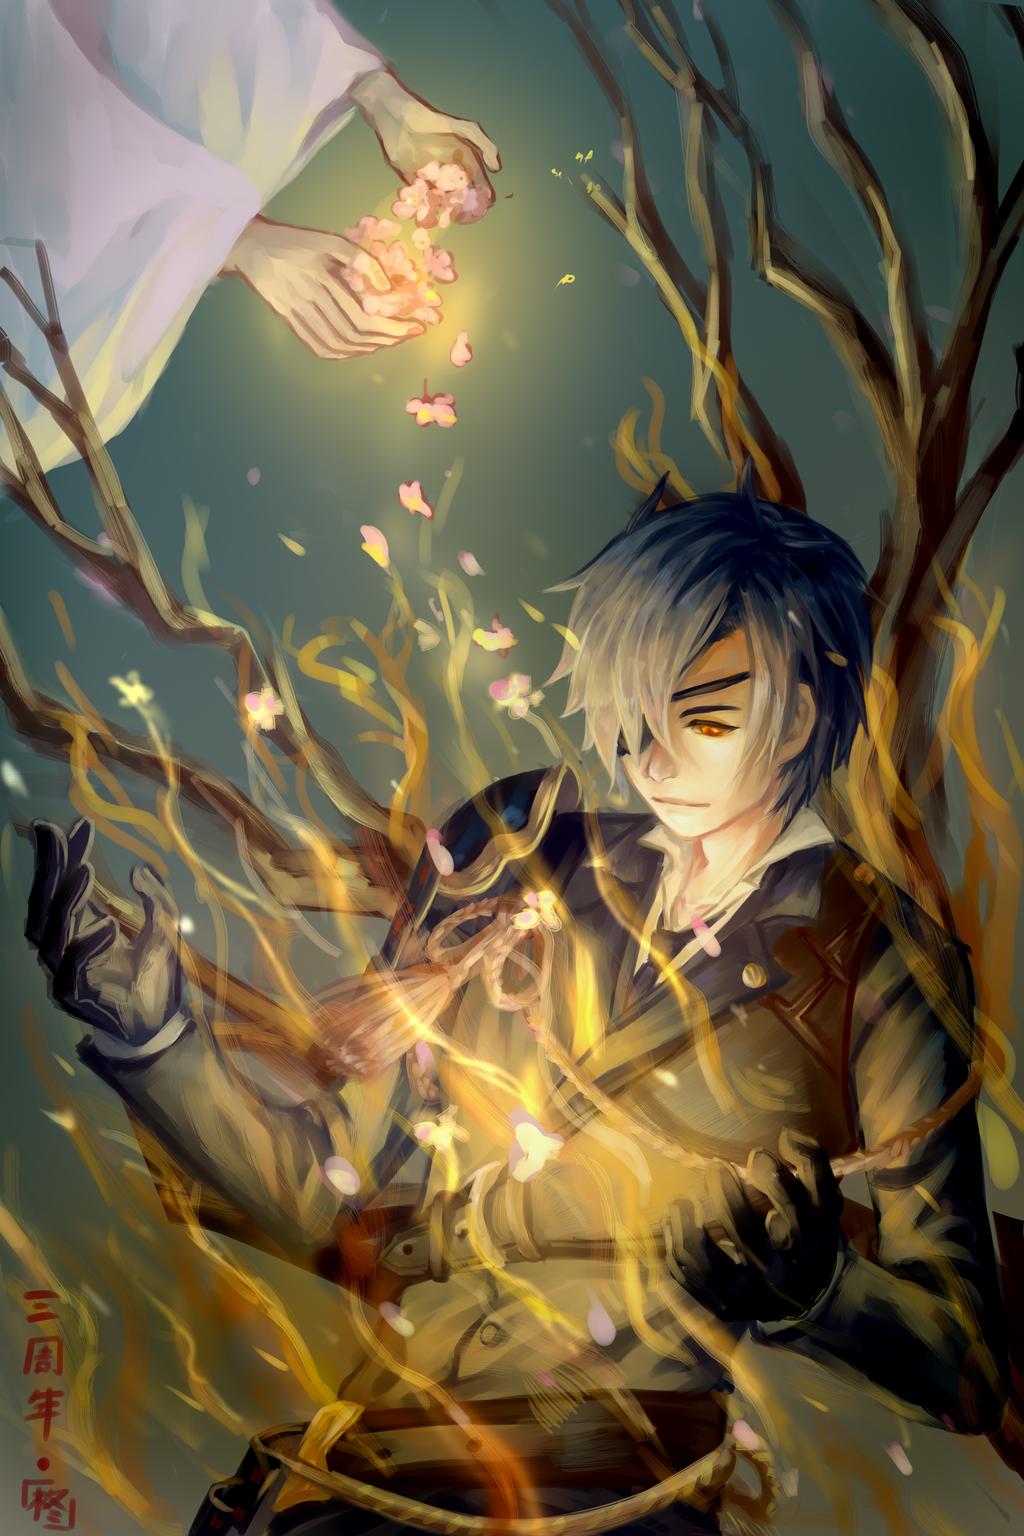 [Fanart] Gentle flame by HiiragiAzayaka